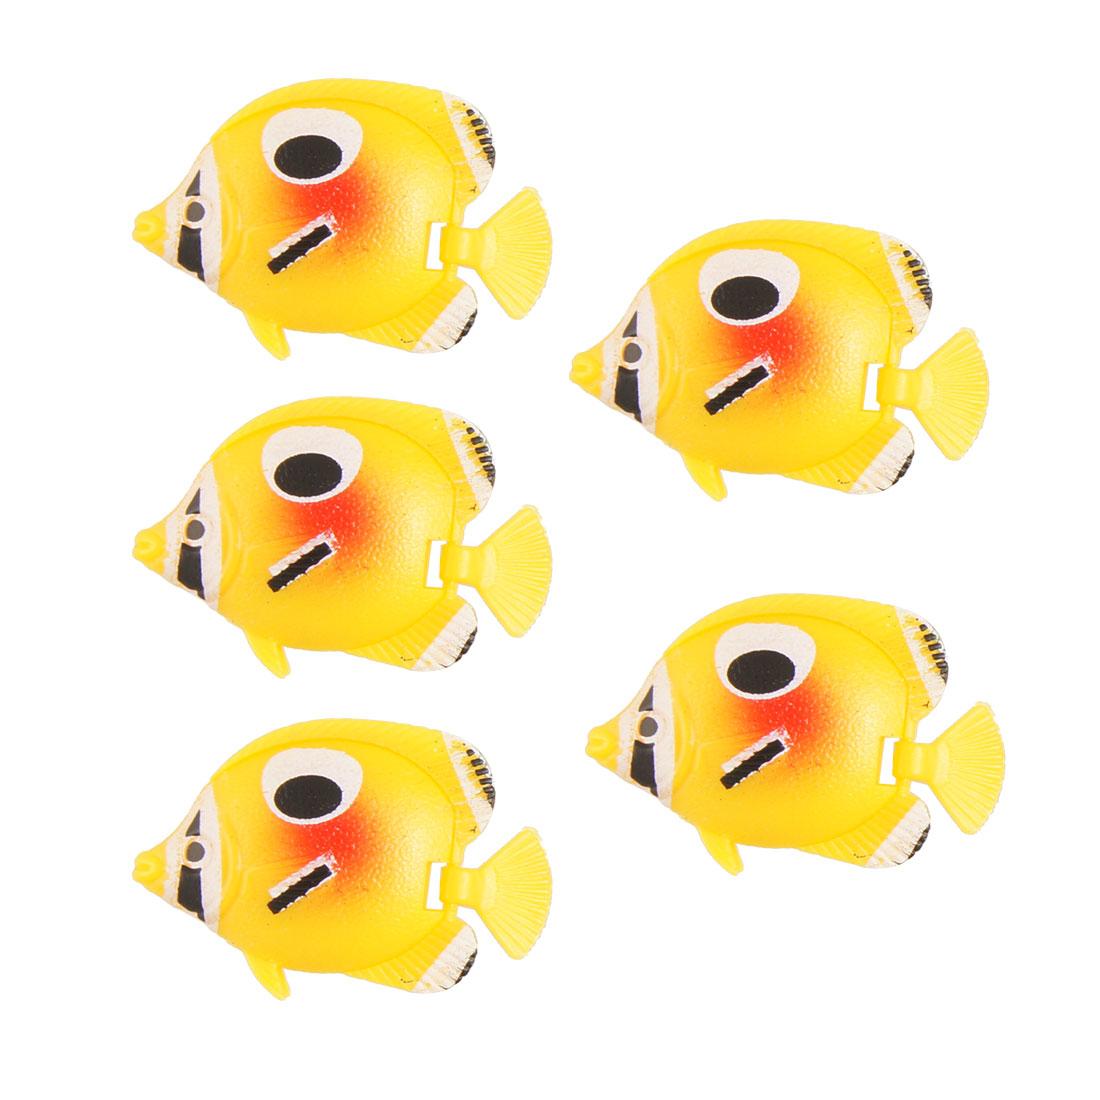 Aquarium Yellow Aquascaping Swing Tail Floating Fish